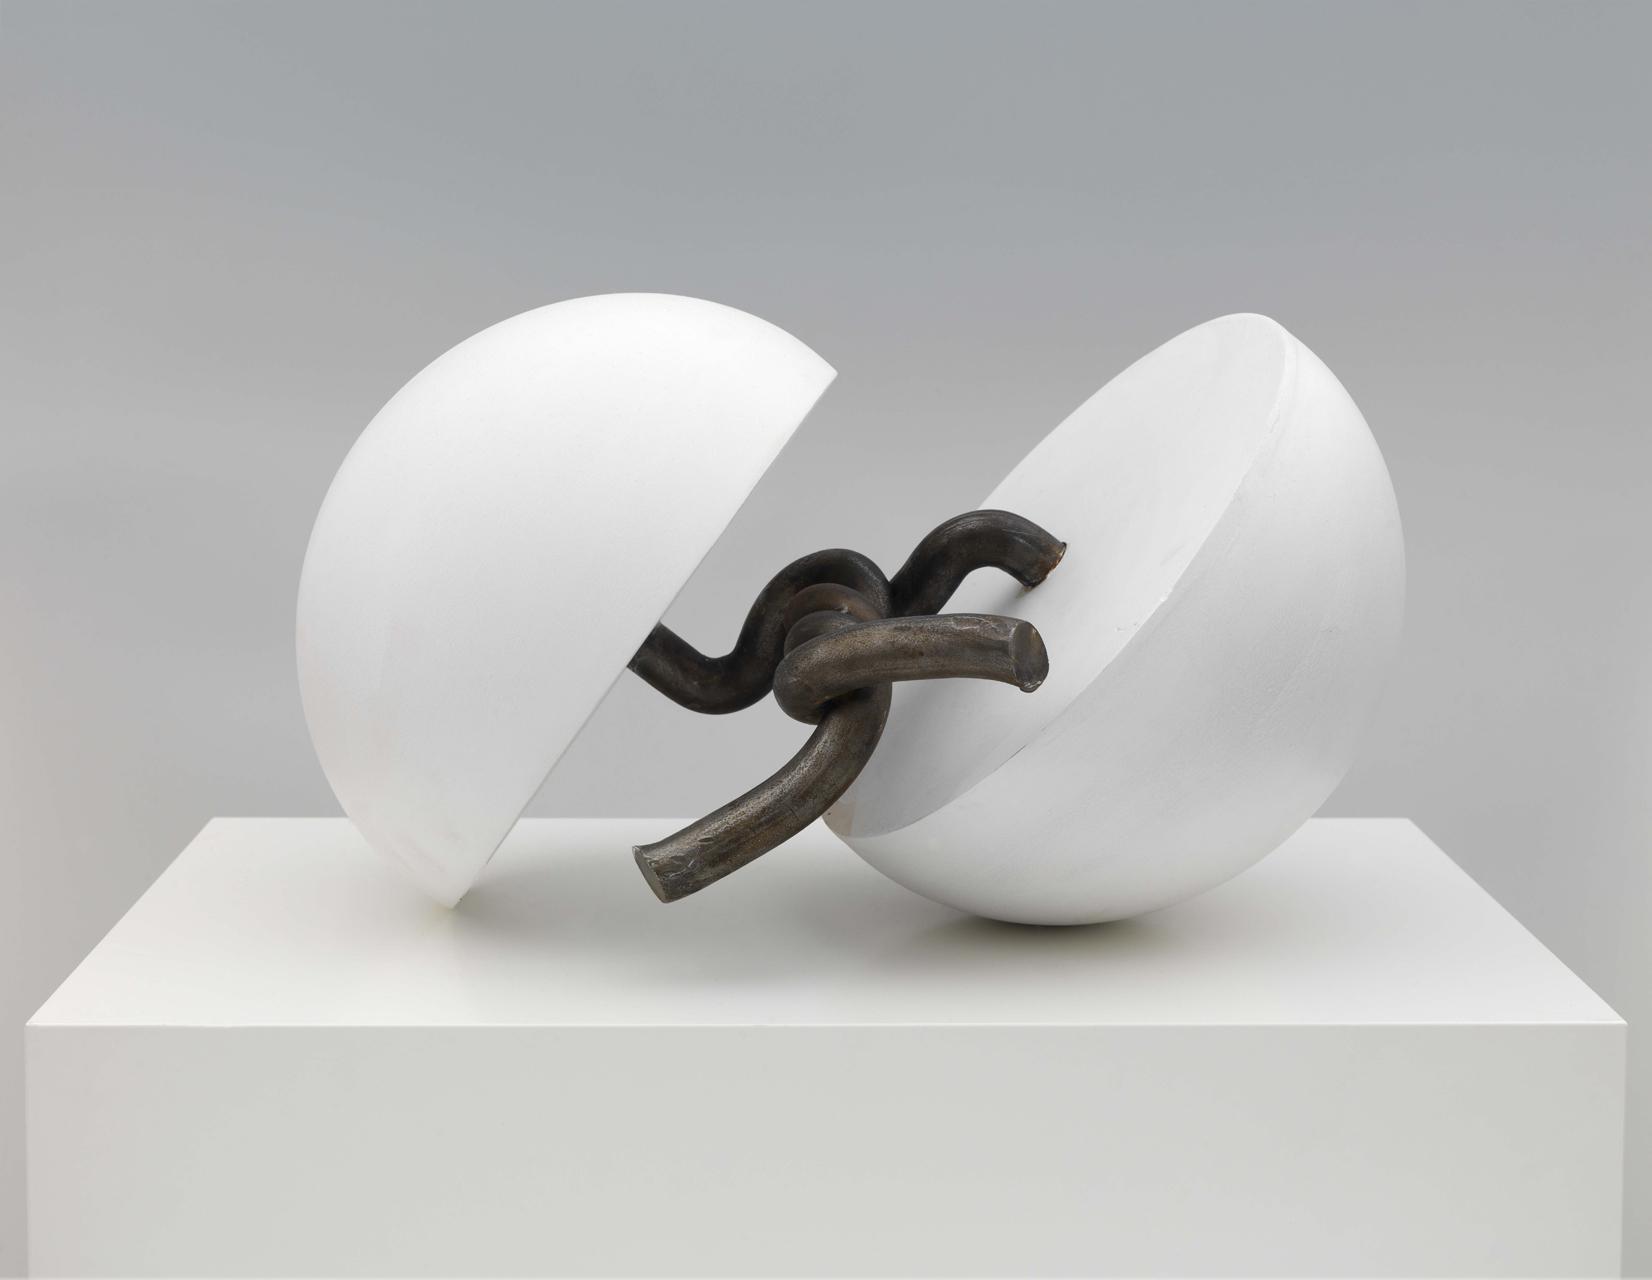 Gary Kuehn, Untitled, 2007, Stahl, Gips, 49 x 33,5 x 27,5 cm